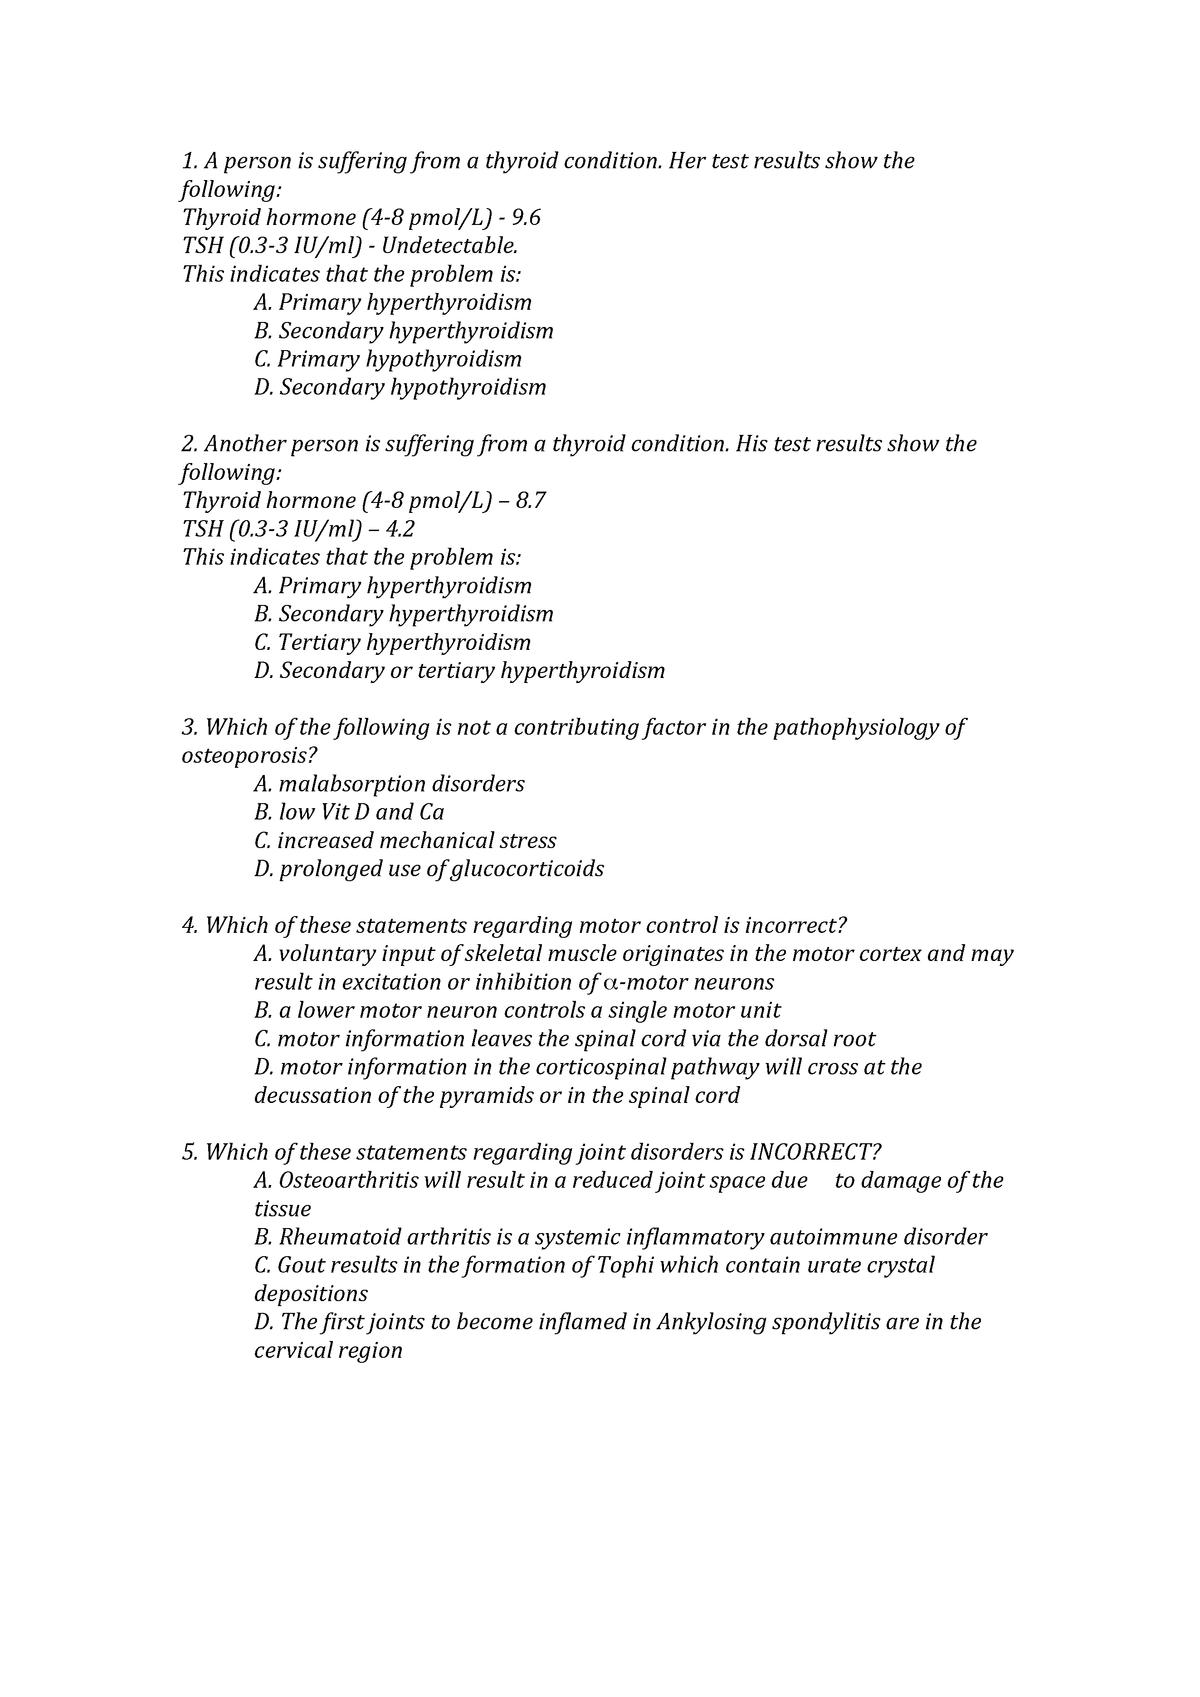 Practical - MCQs, week 10 - HUBS2505: Human Pathophysiology - StuDocu